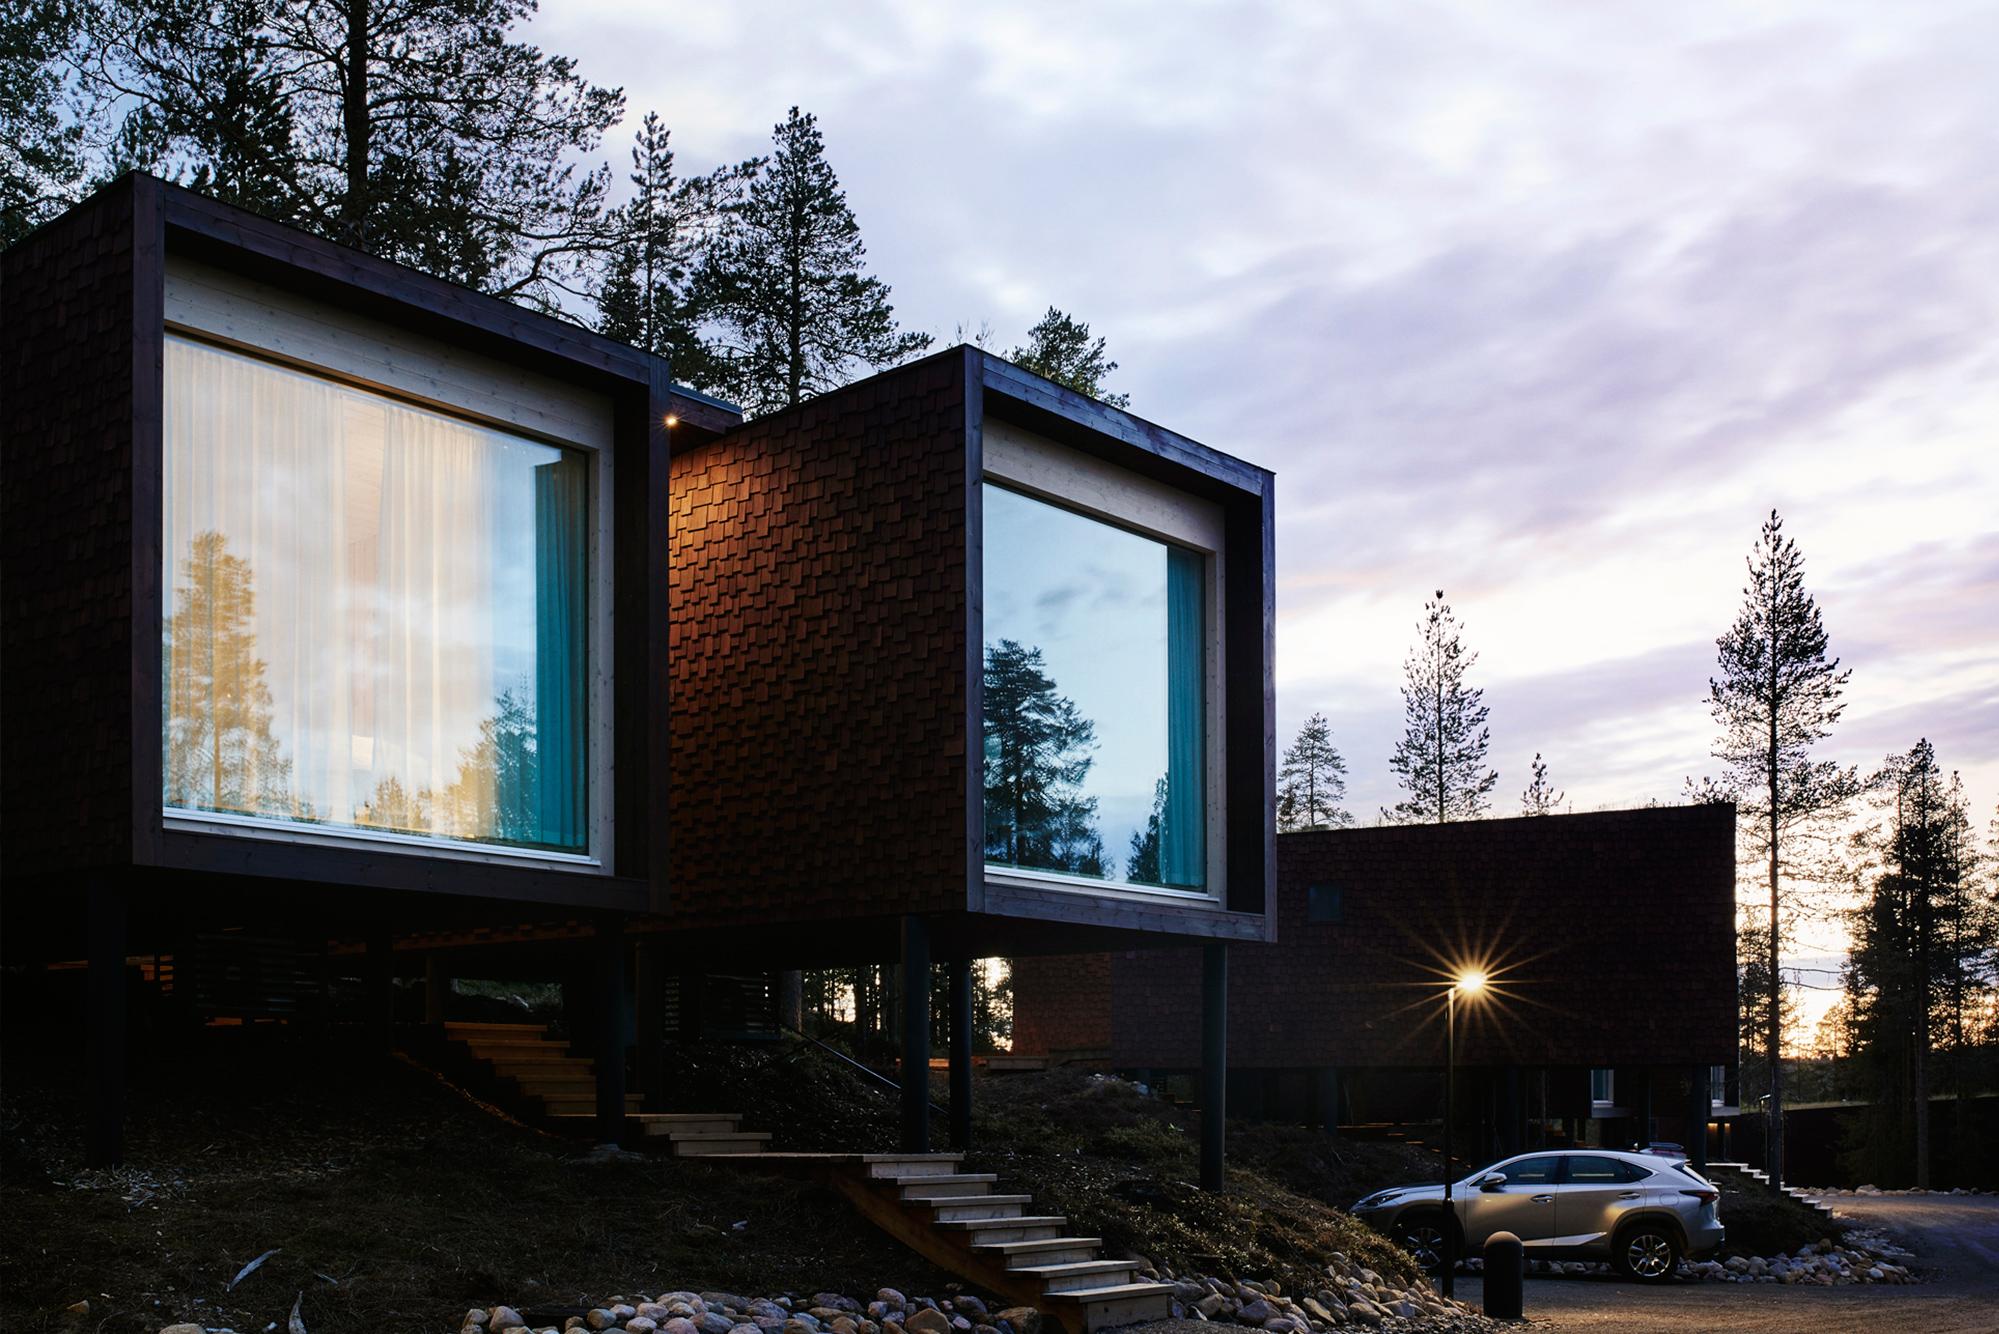 Arctic tree house architecture